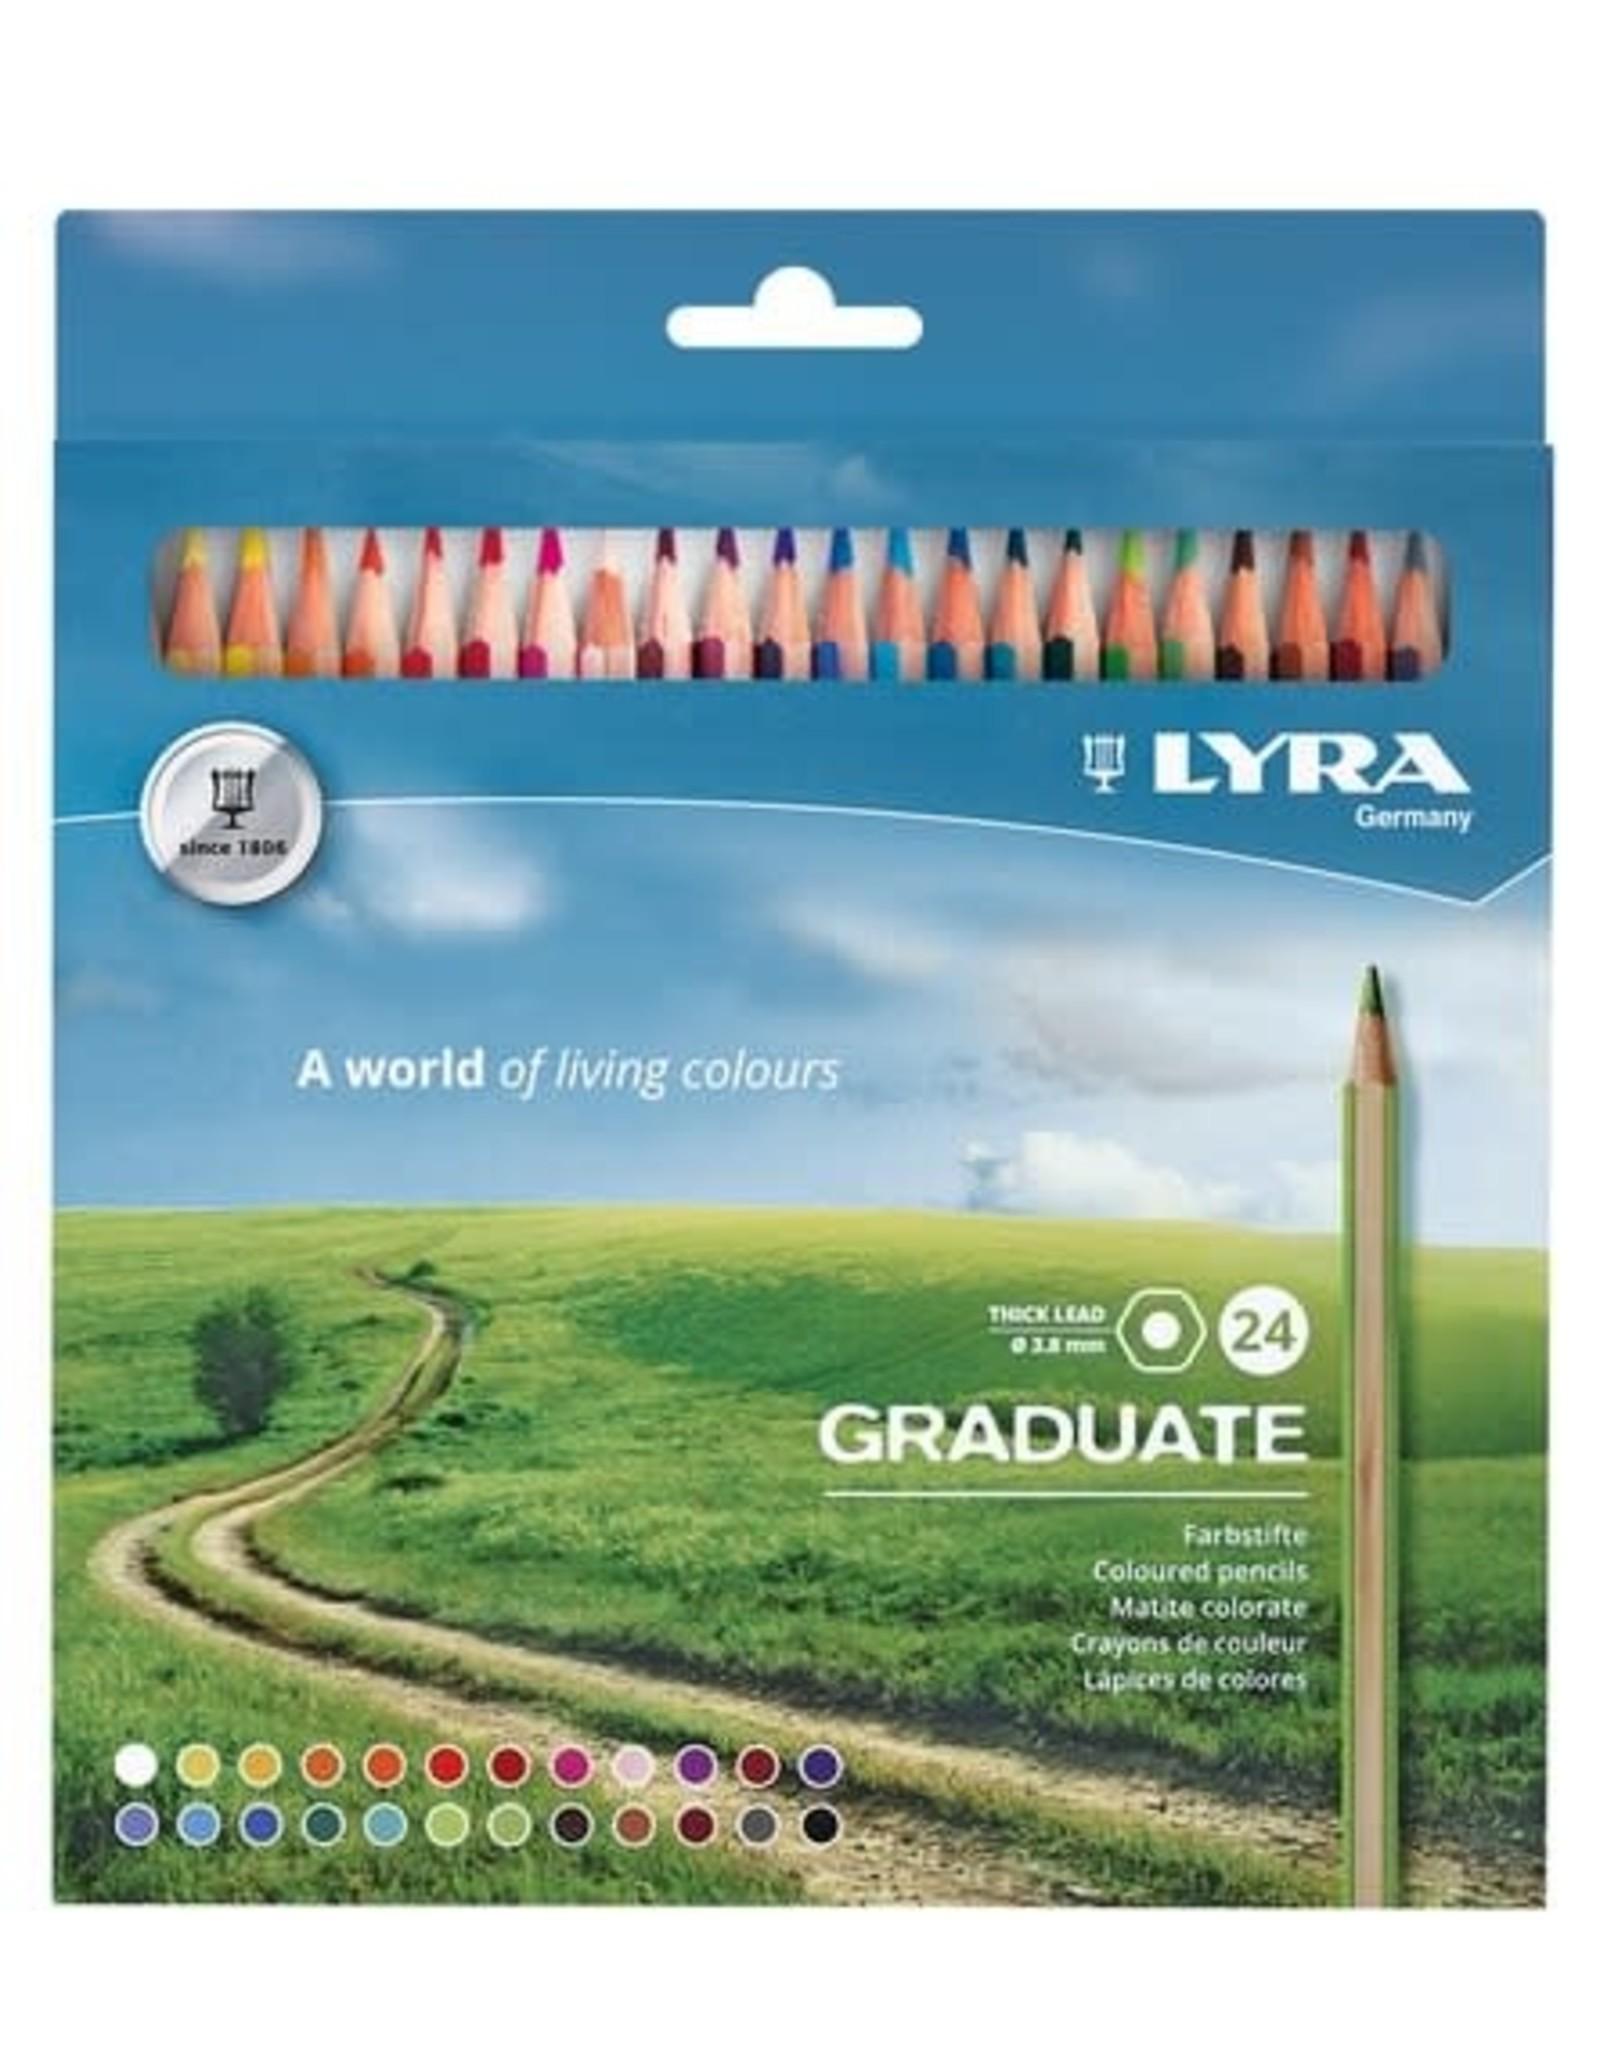 LYRA Graduate Coloured Pencil Set 24pc